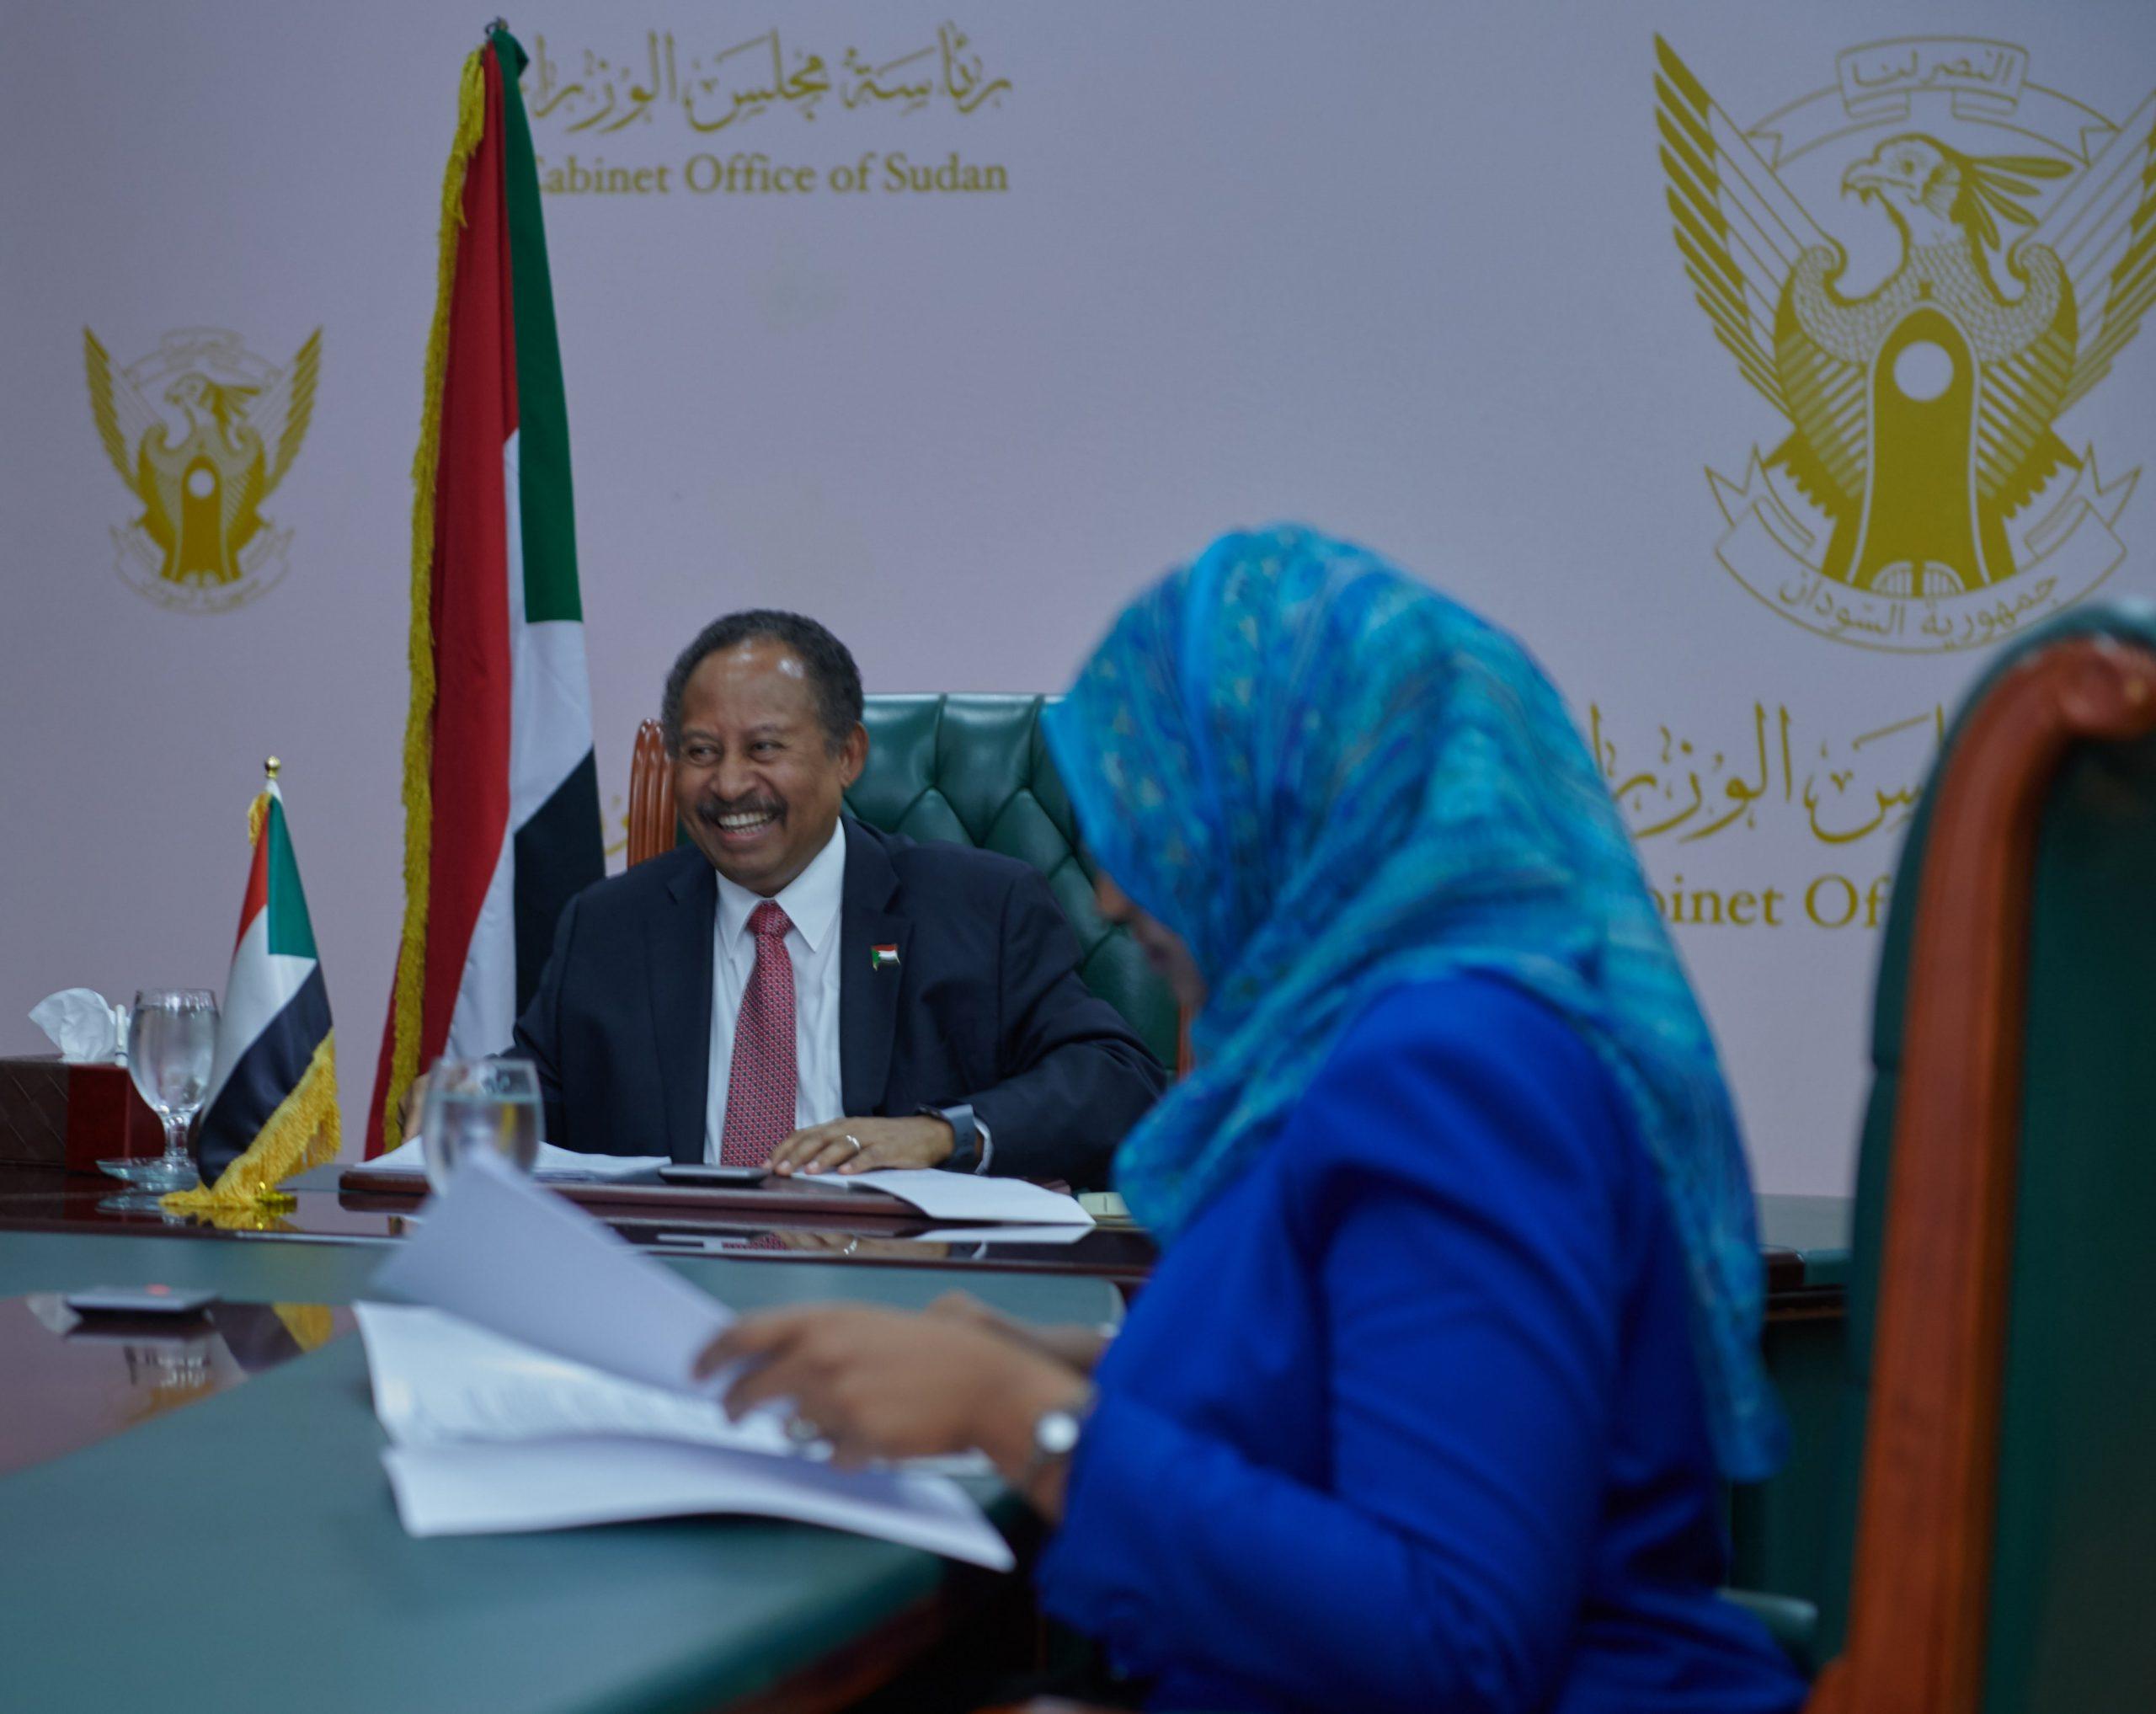 Sudan Donor Event Raises $1.8 billion